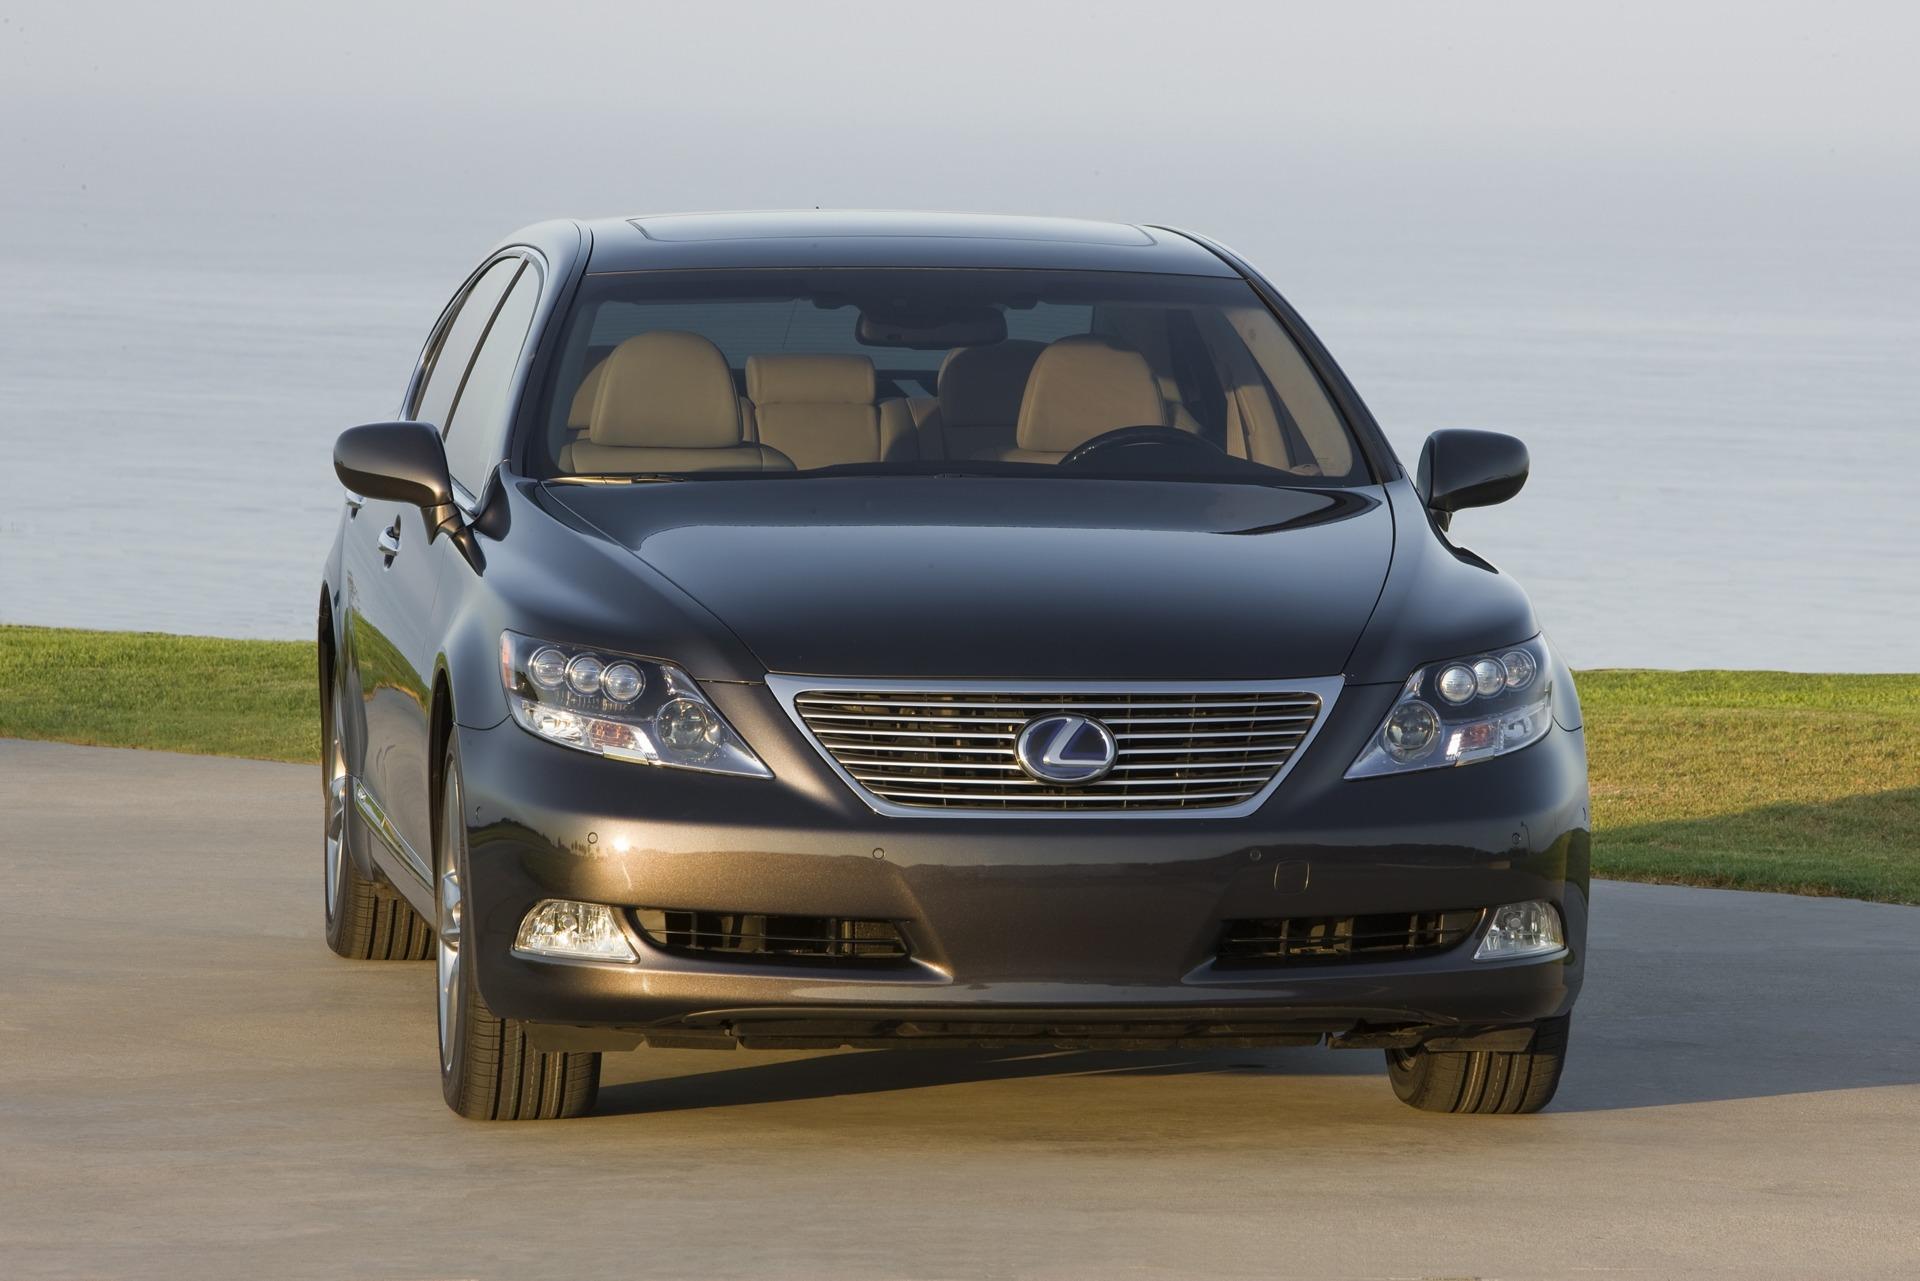 https://www.conceptcarz.com/images/Lexus/lexus_LS-600_2008_Pebble-Beach_01.jpg